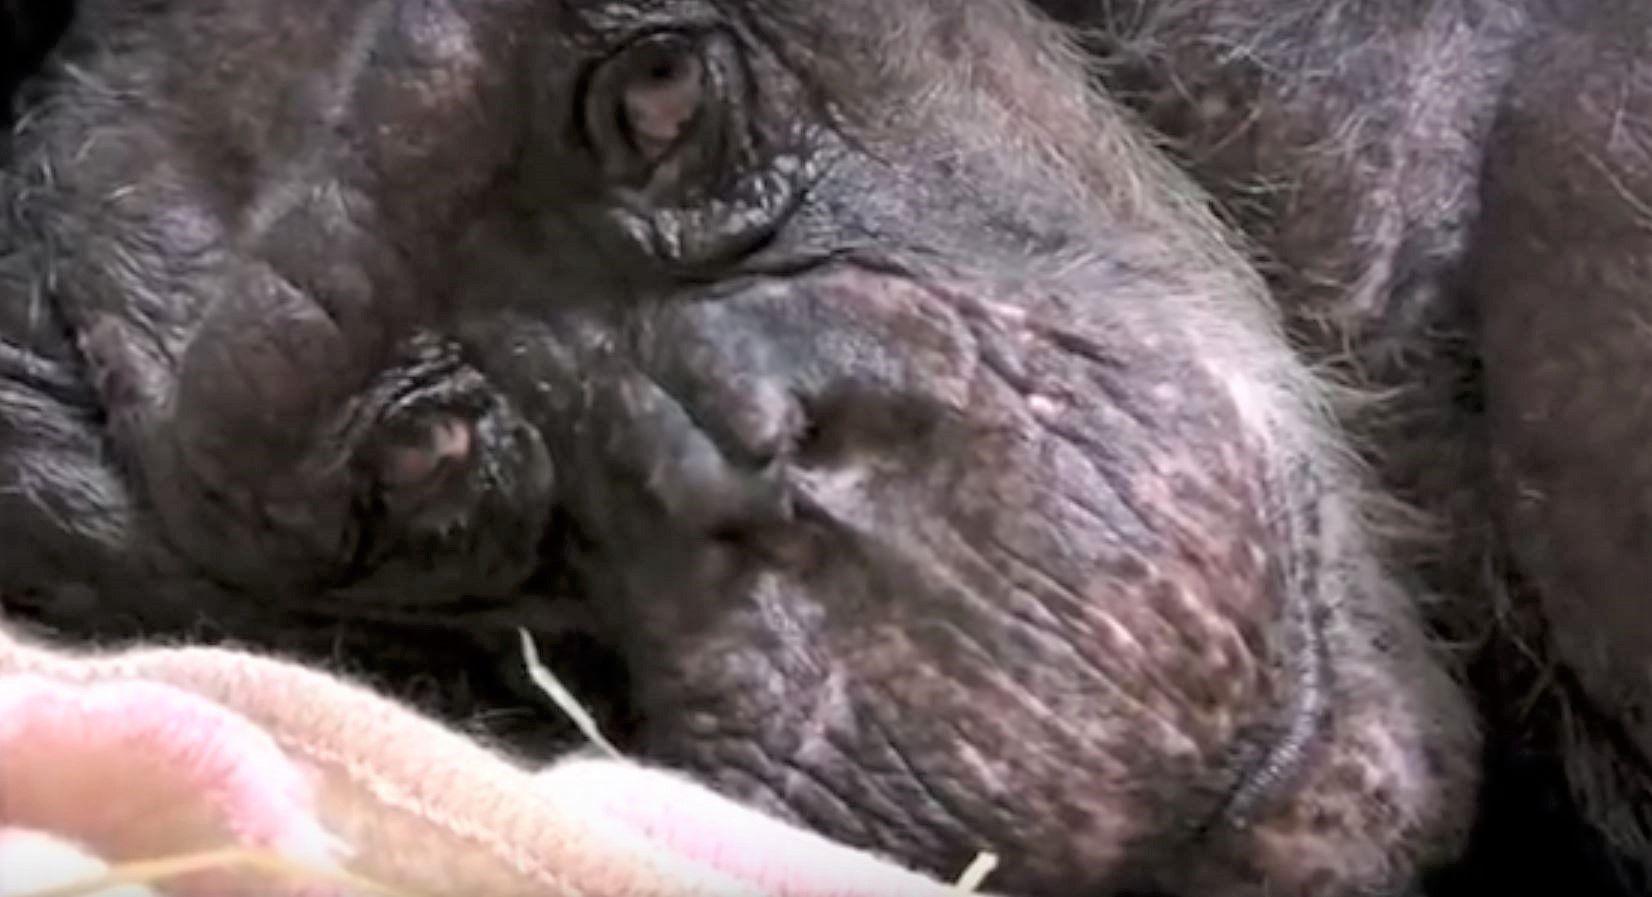 Closeup of chimpanzee's face